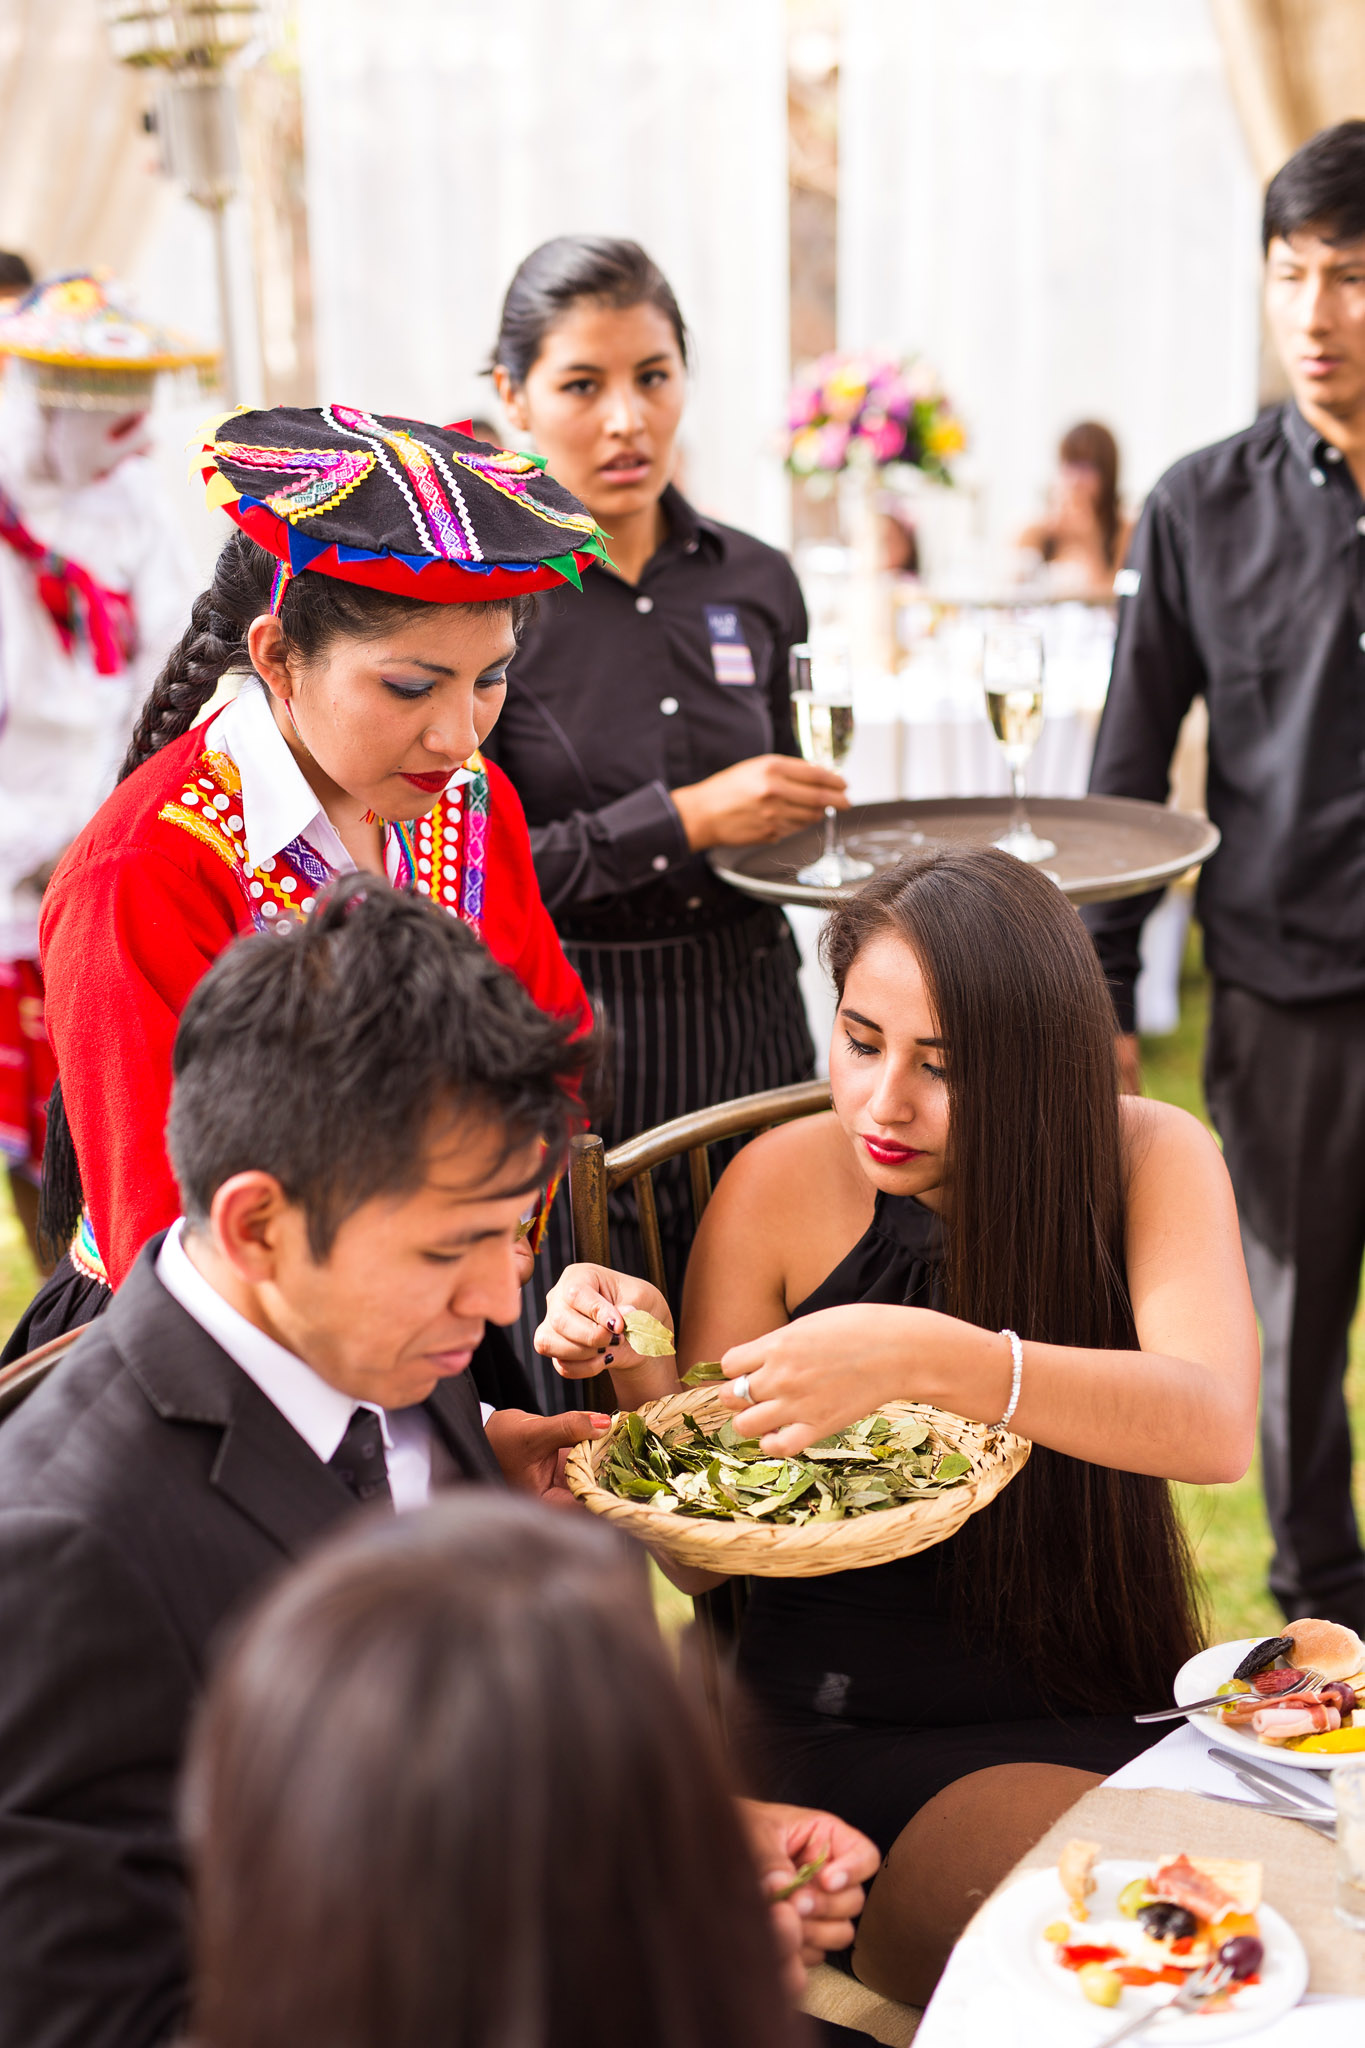 Wedding-Travellers-Destination-Wedding-Peru-Cusco-Hacienda-Sarapampa-Sacred-Valley-traditional-andean-ceremony-coca-leaf